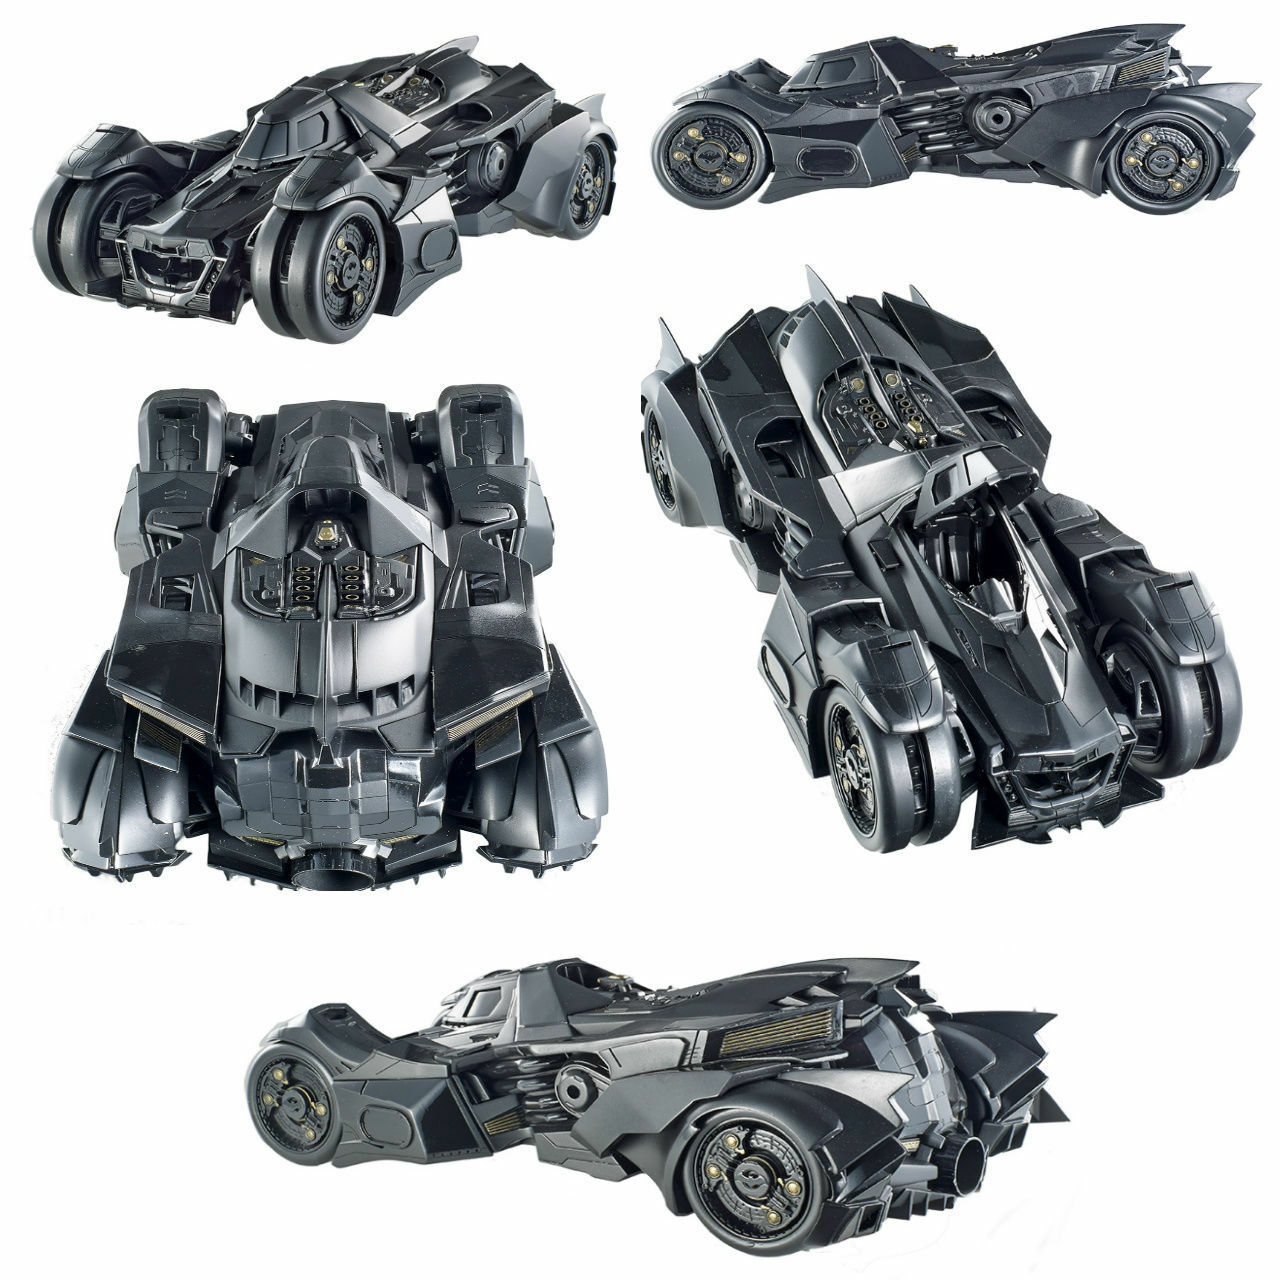 1 18 Hot Wheels Elite Batman Arkham Batmobile Car Model Bly23